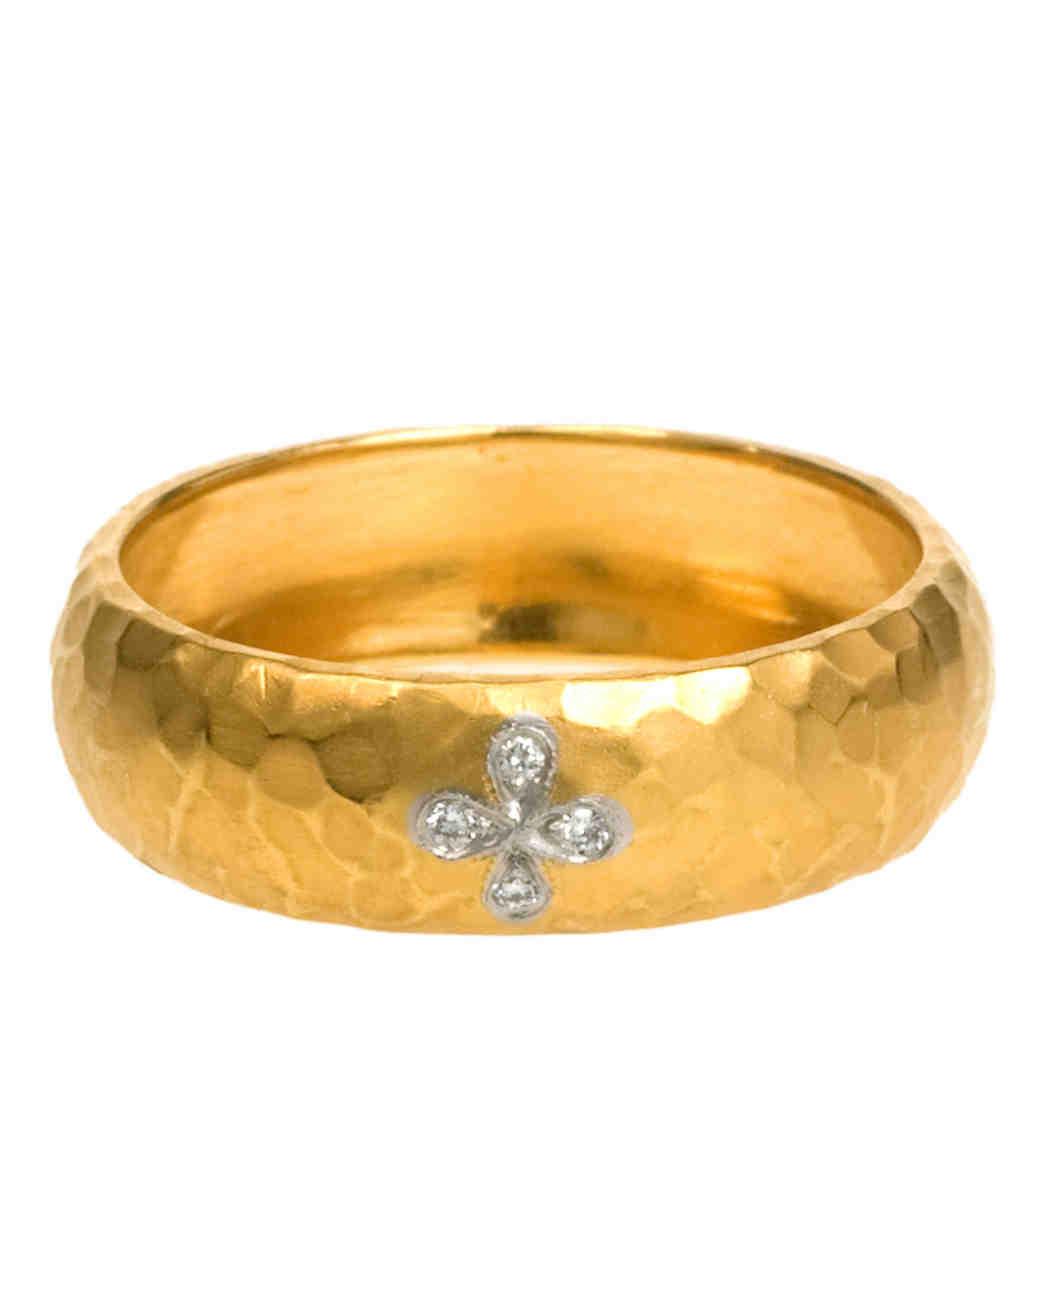 gold-wedding-bands-cathy-waterman-ring-0415.jpg